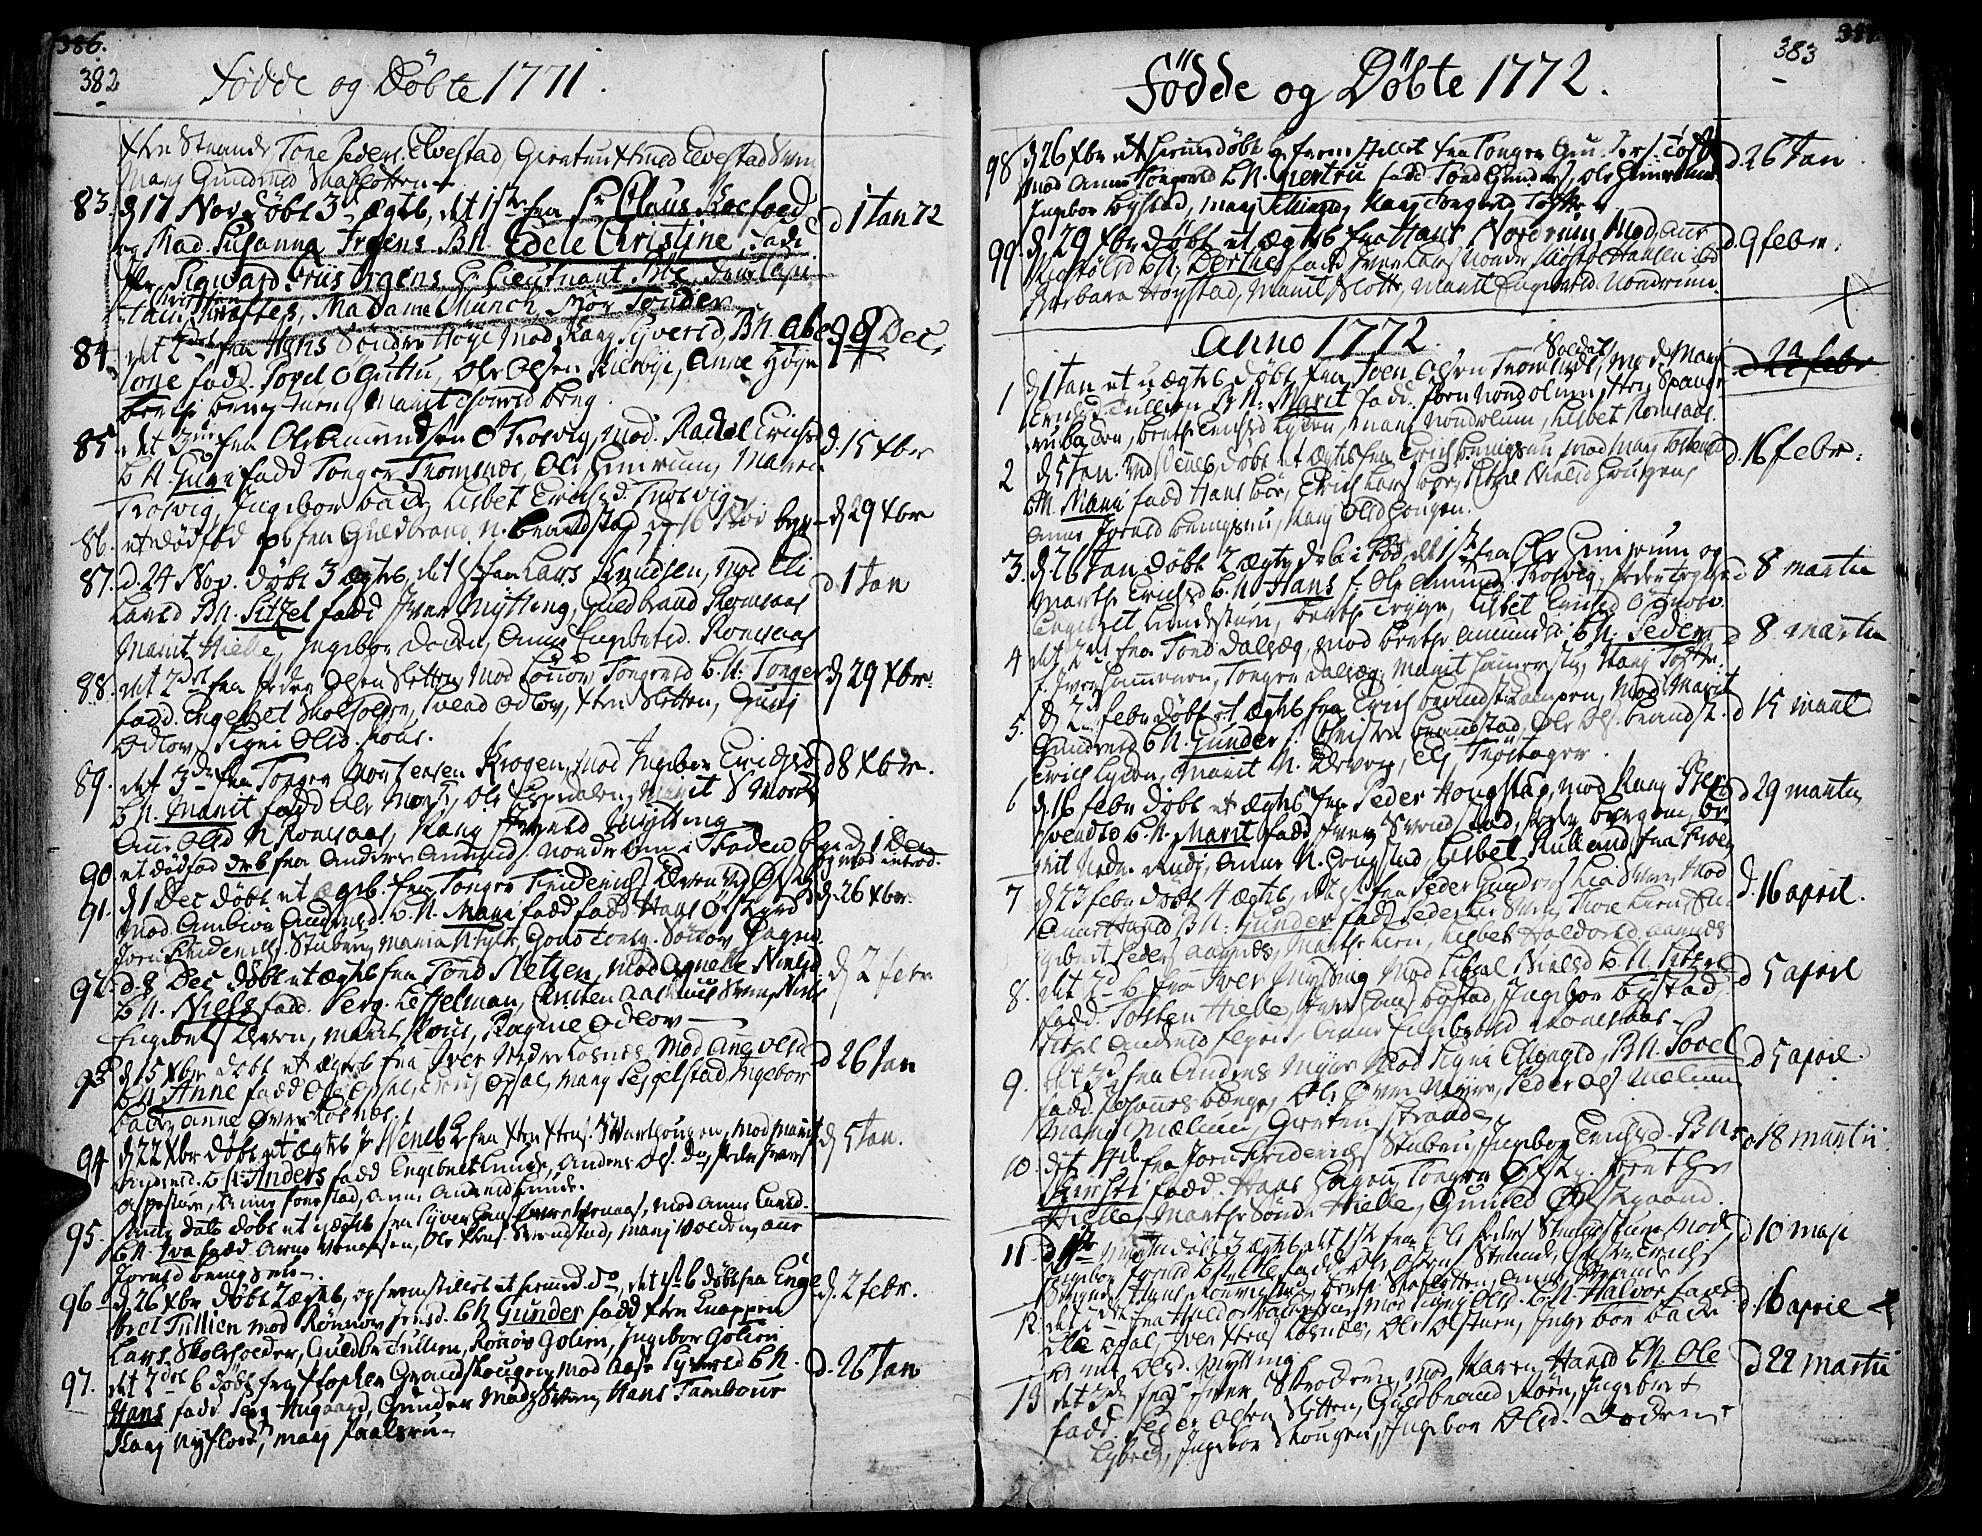 SAH, Ringebu prestekontor, Ministerialbok nr. 2, 1734-1780, s. 382-383